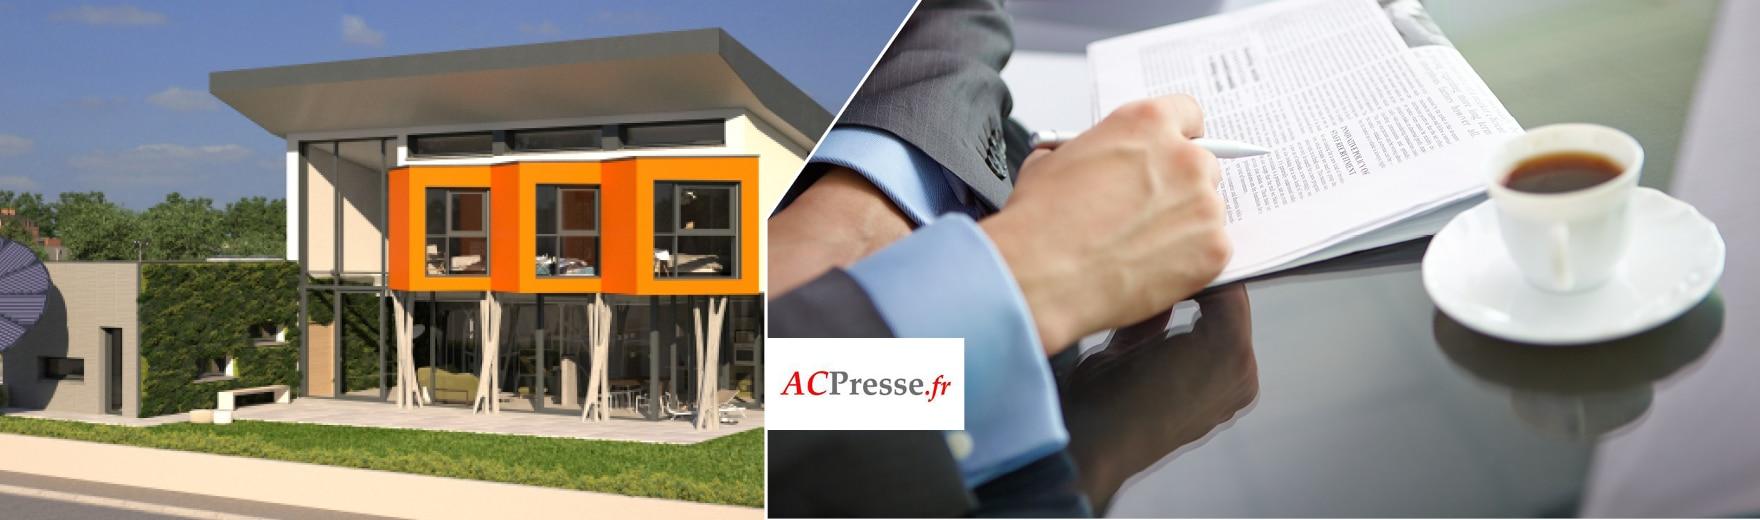 ACPresse